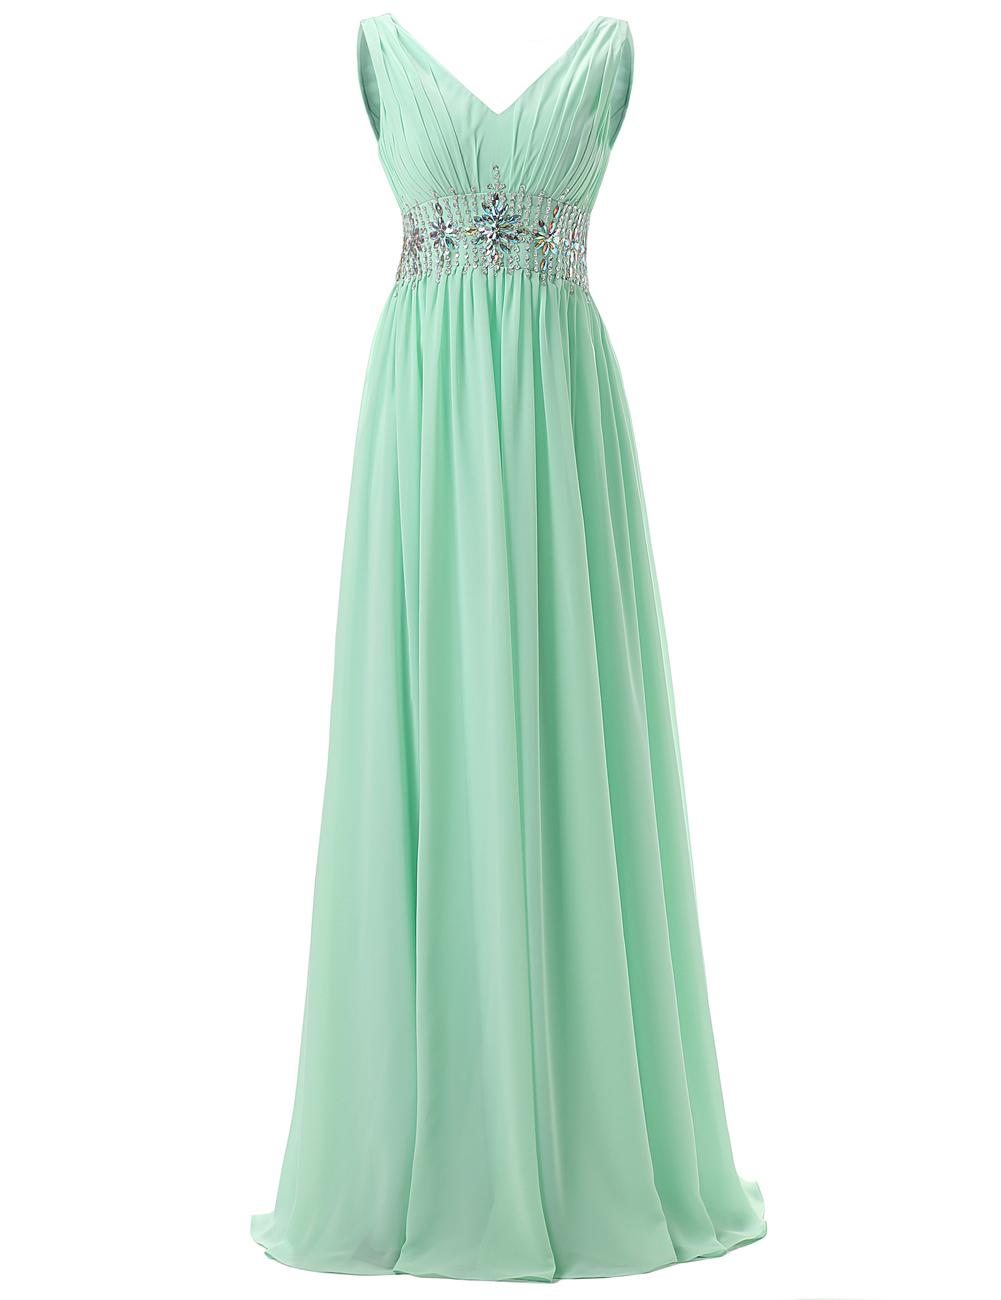 Elegant V-neck Beading Long Mint Prom Dress Formal Evening Gown